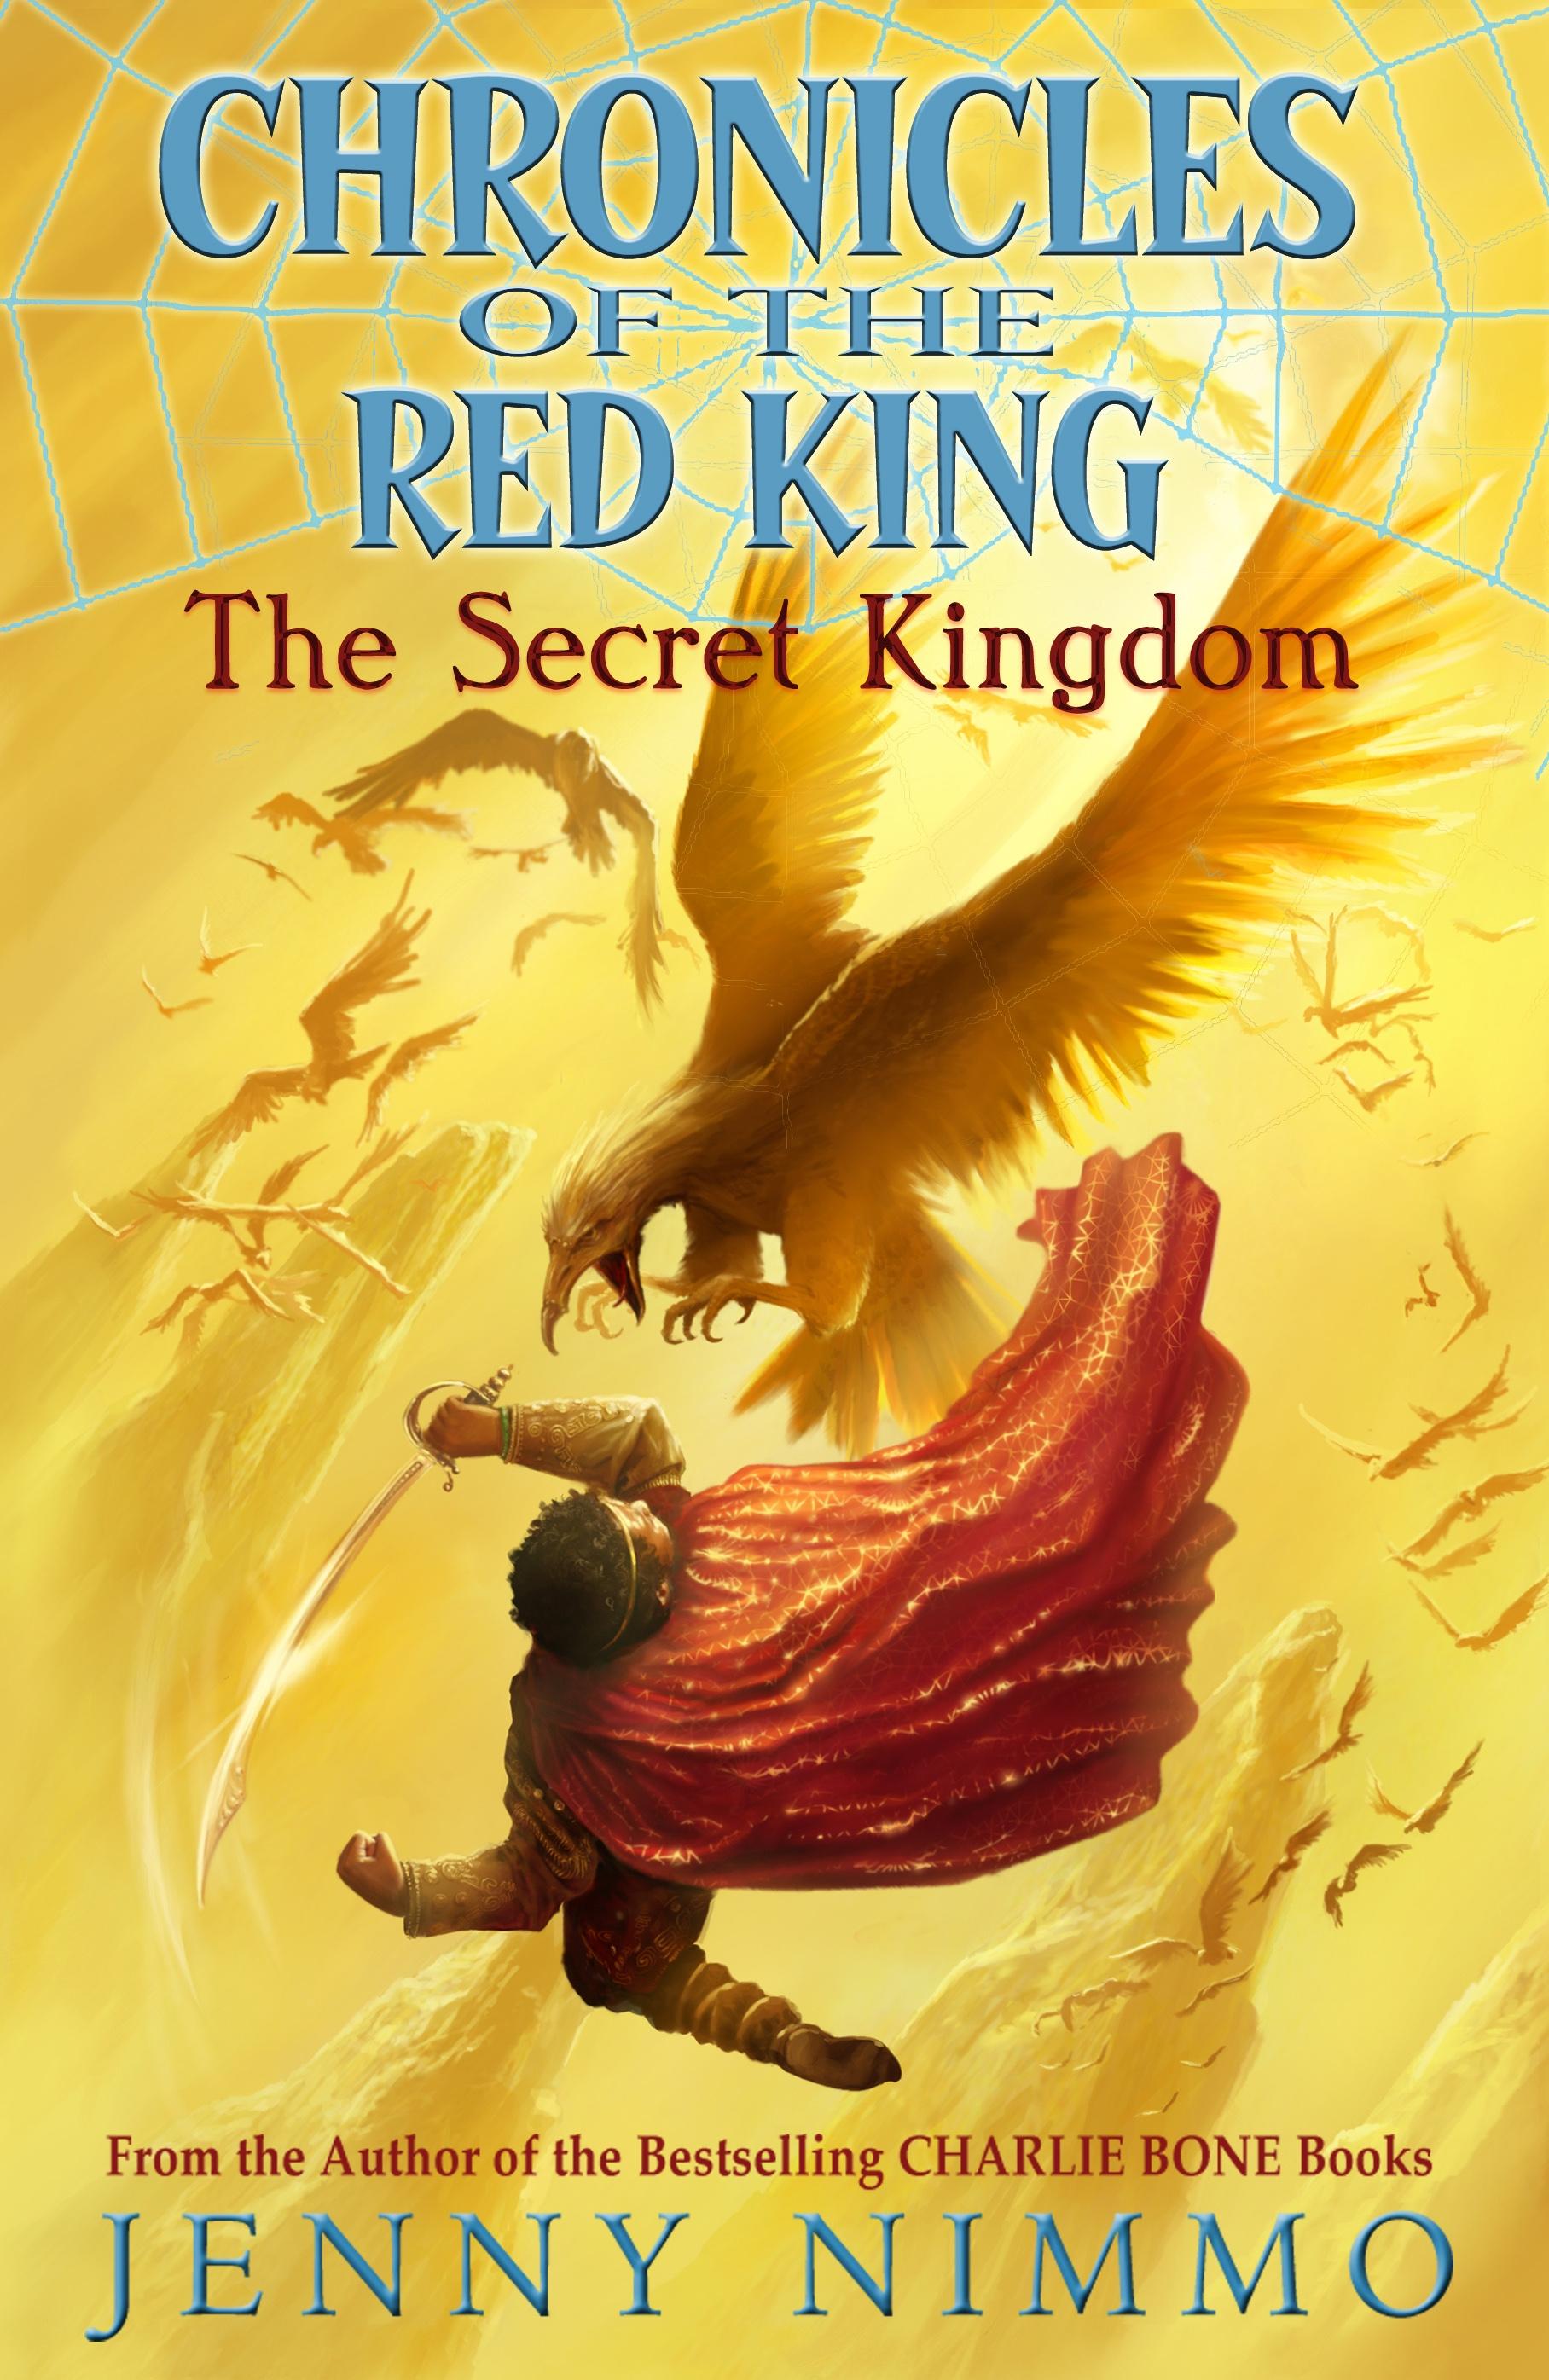 nimmo-red king1.JPG